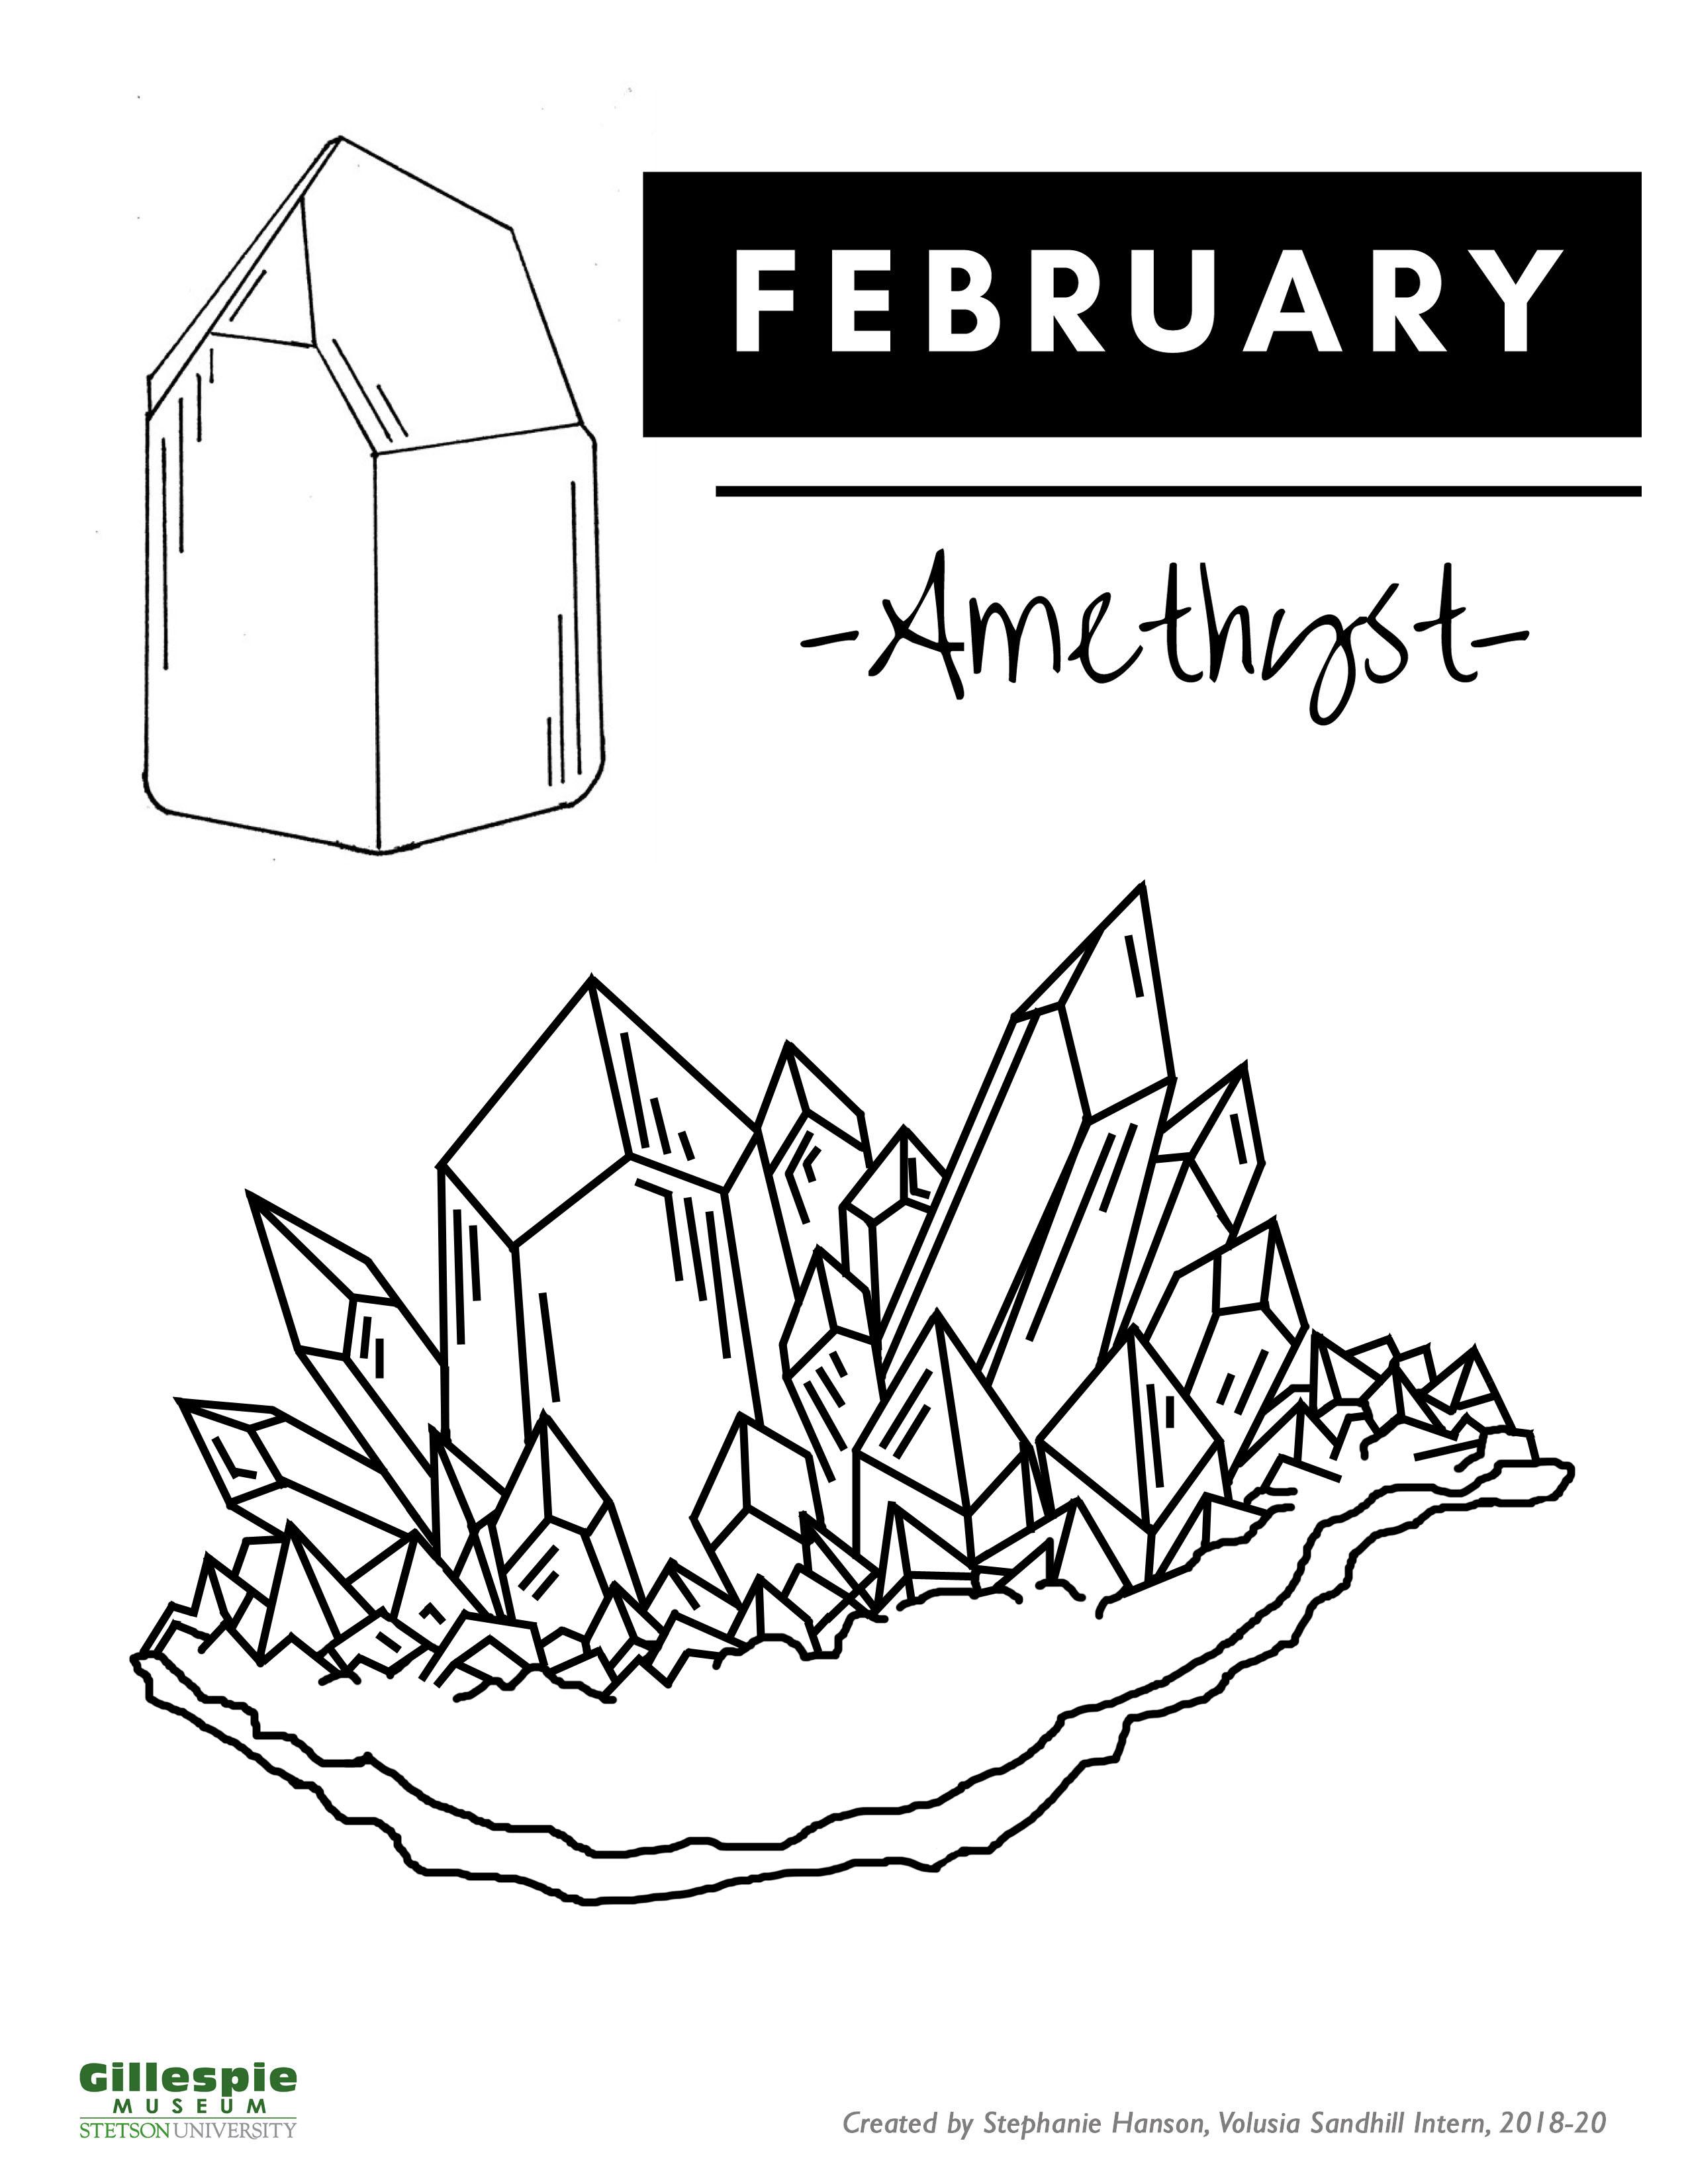 February birthstone